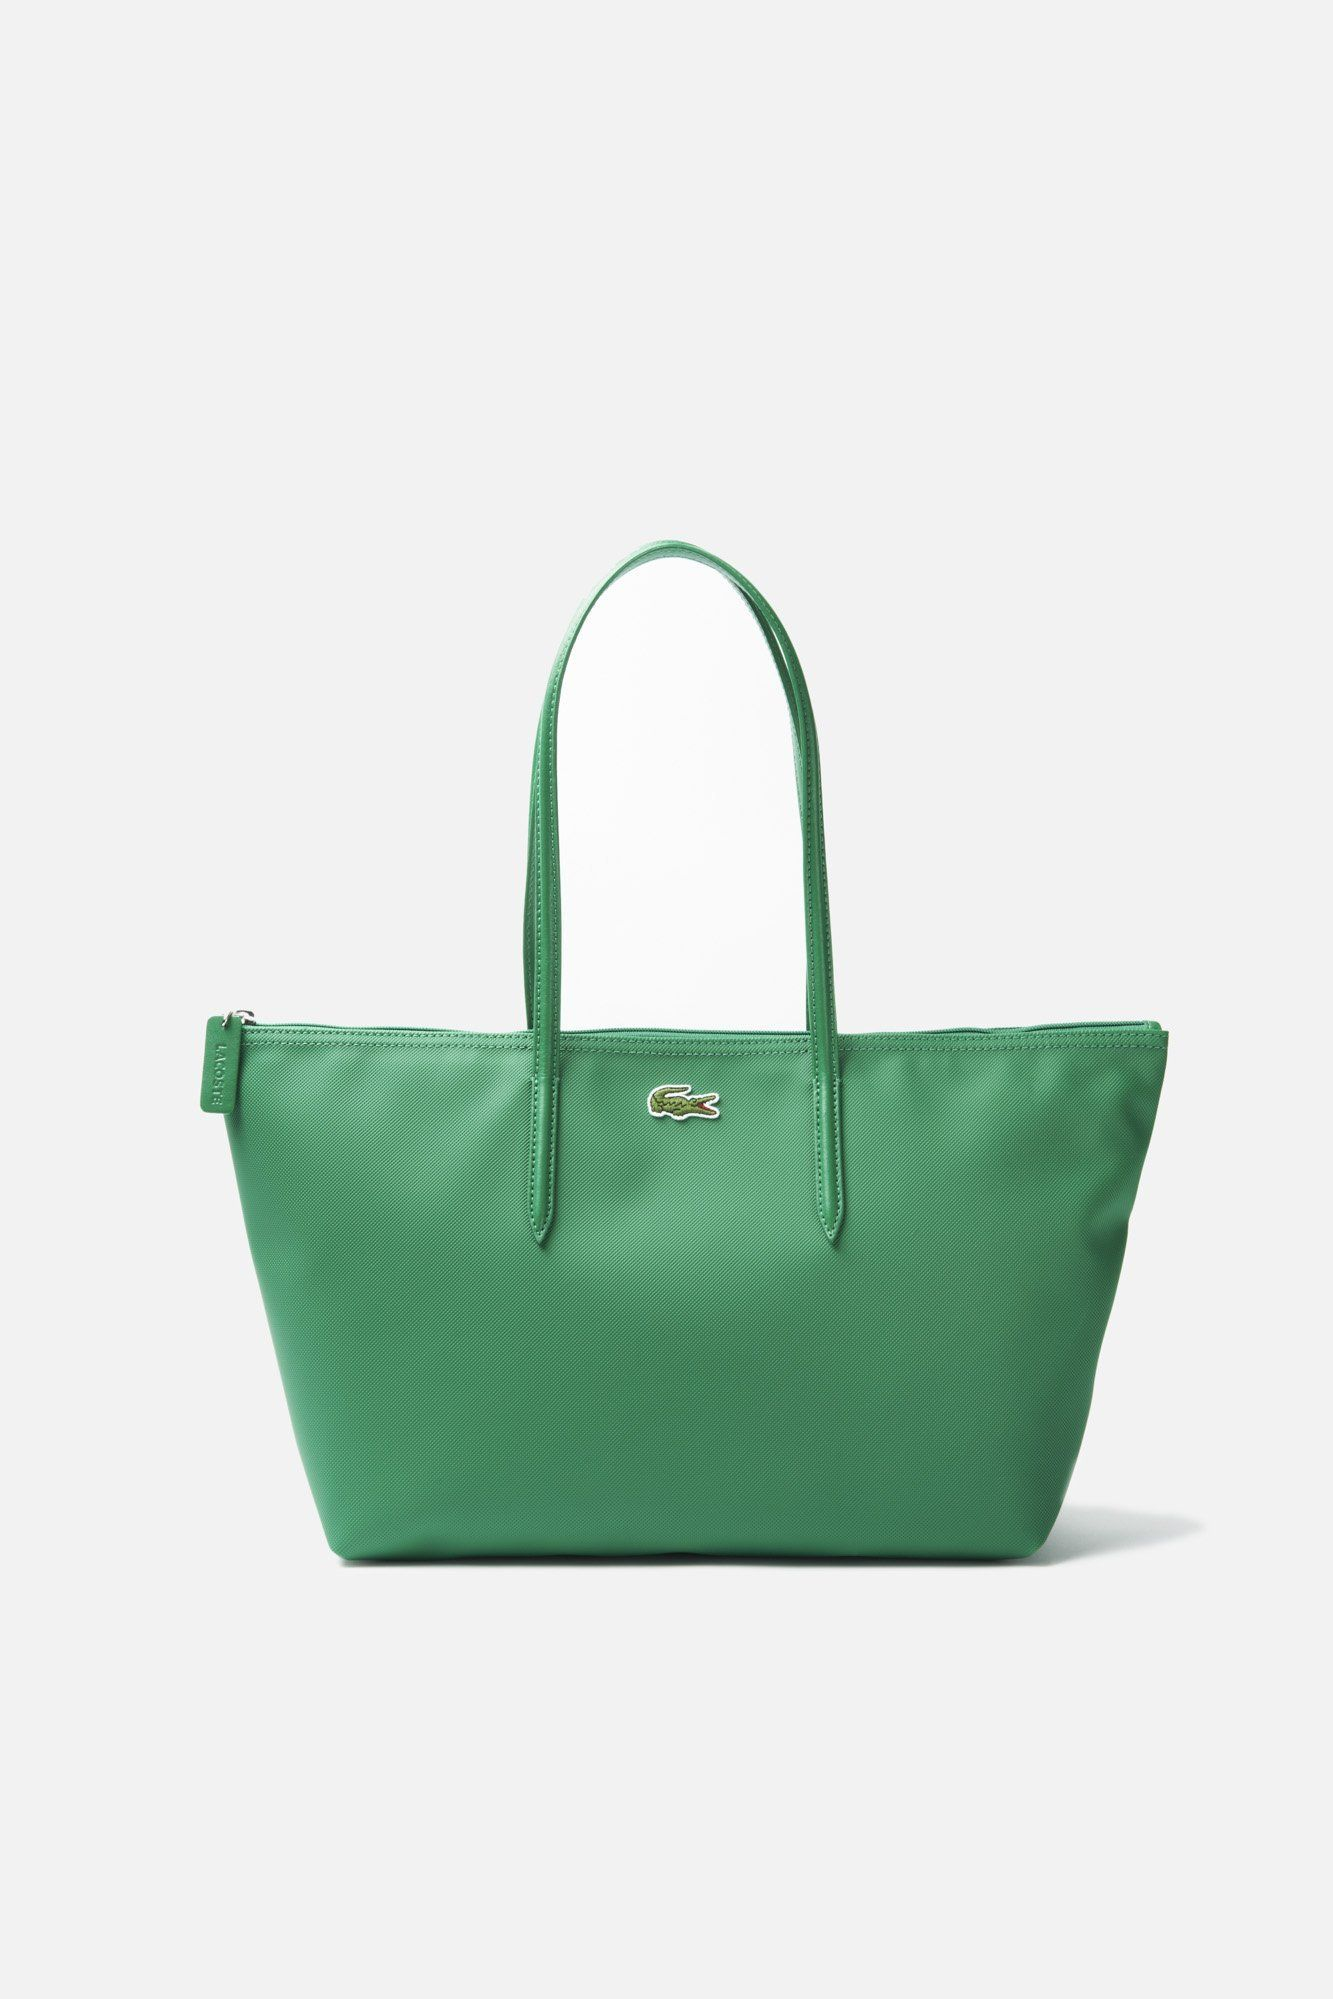 Lacoste large  shopping bag   Bags   Purses   Pinterest   Bags ... 76ab79bf5b